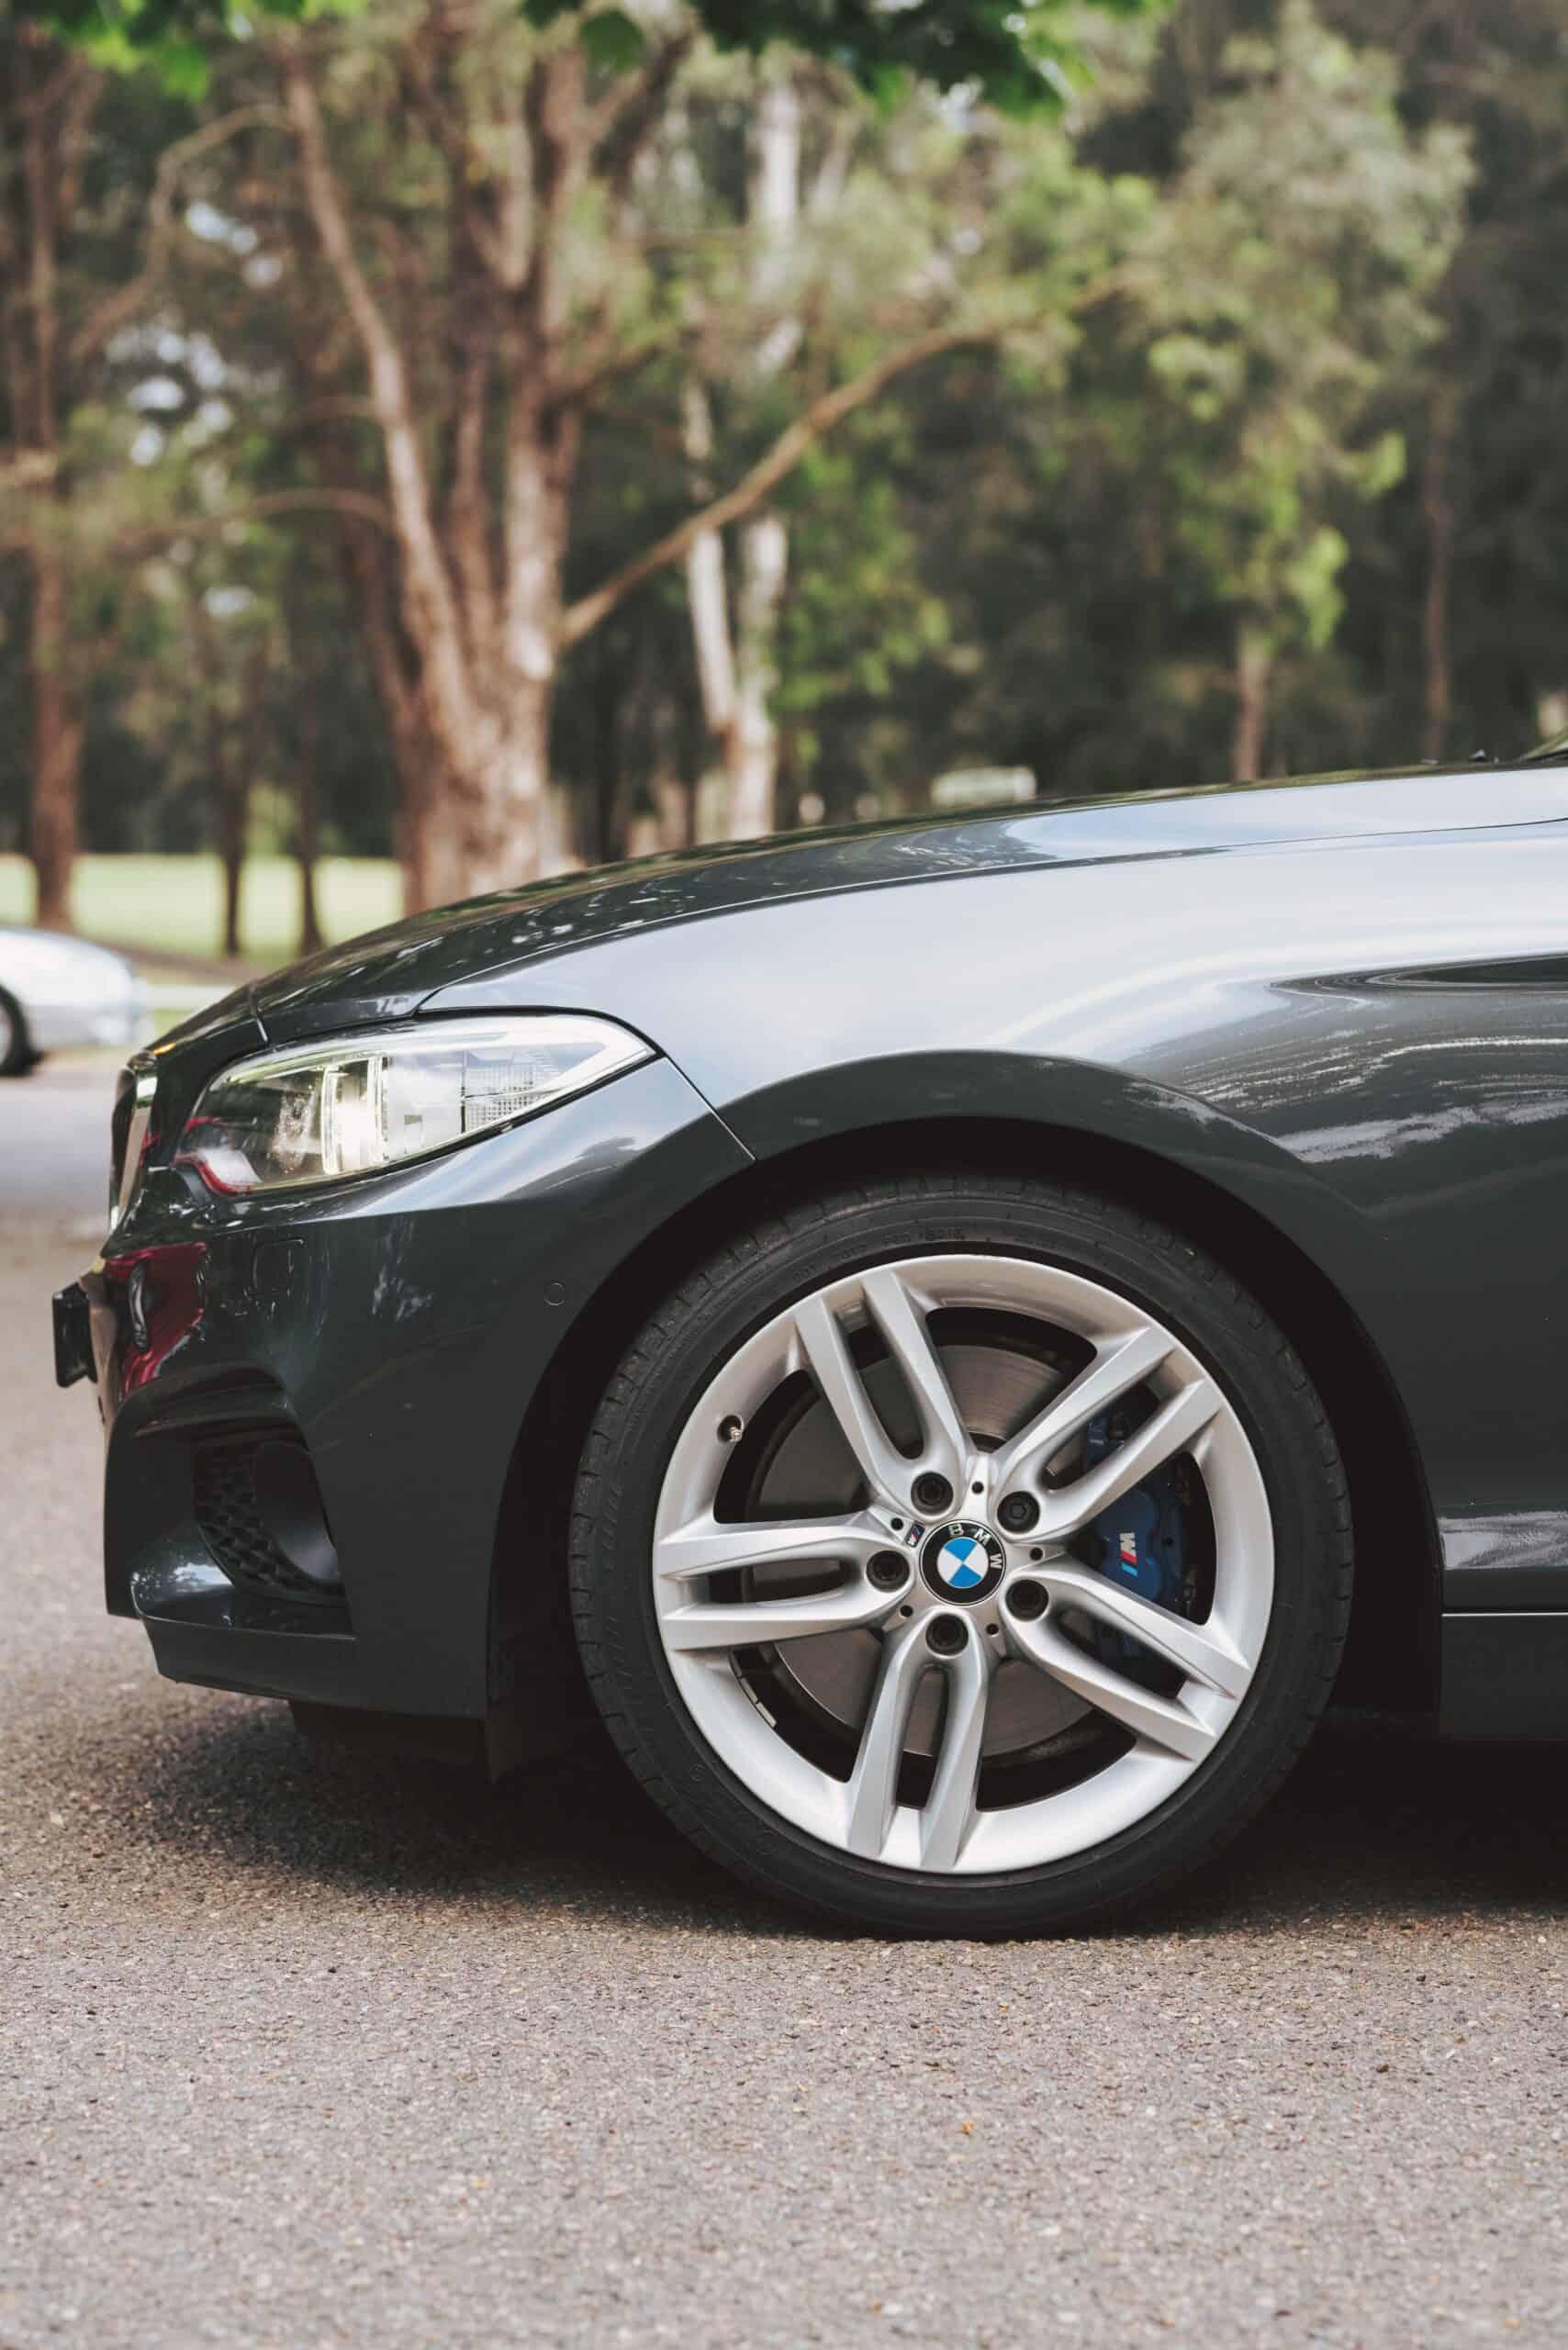 BMW Scratch Paint Repair